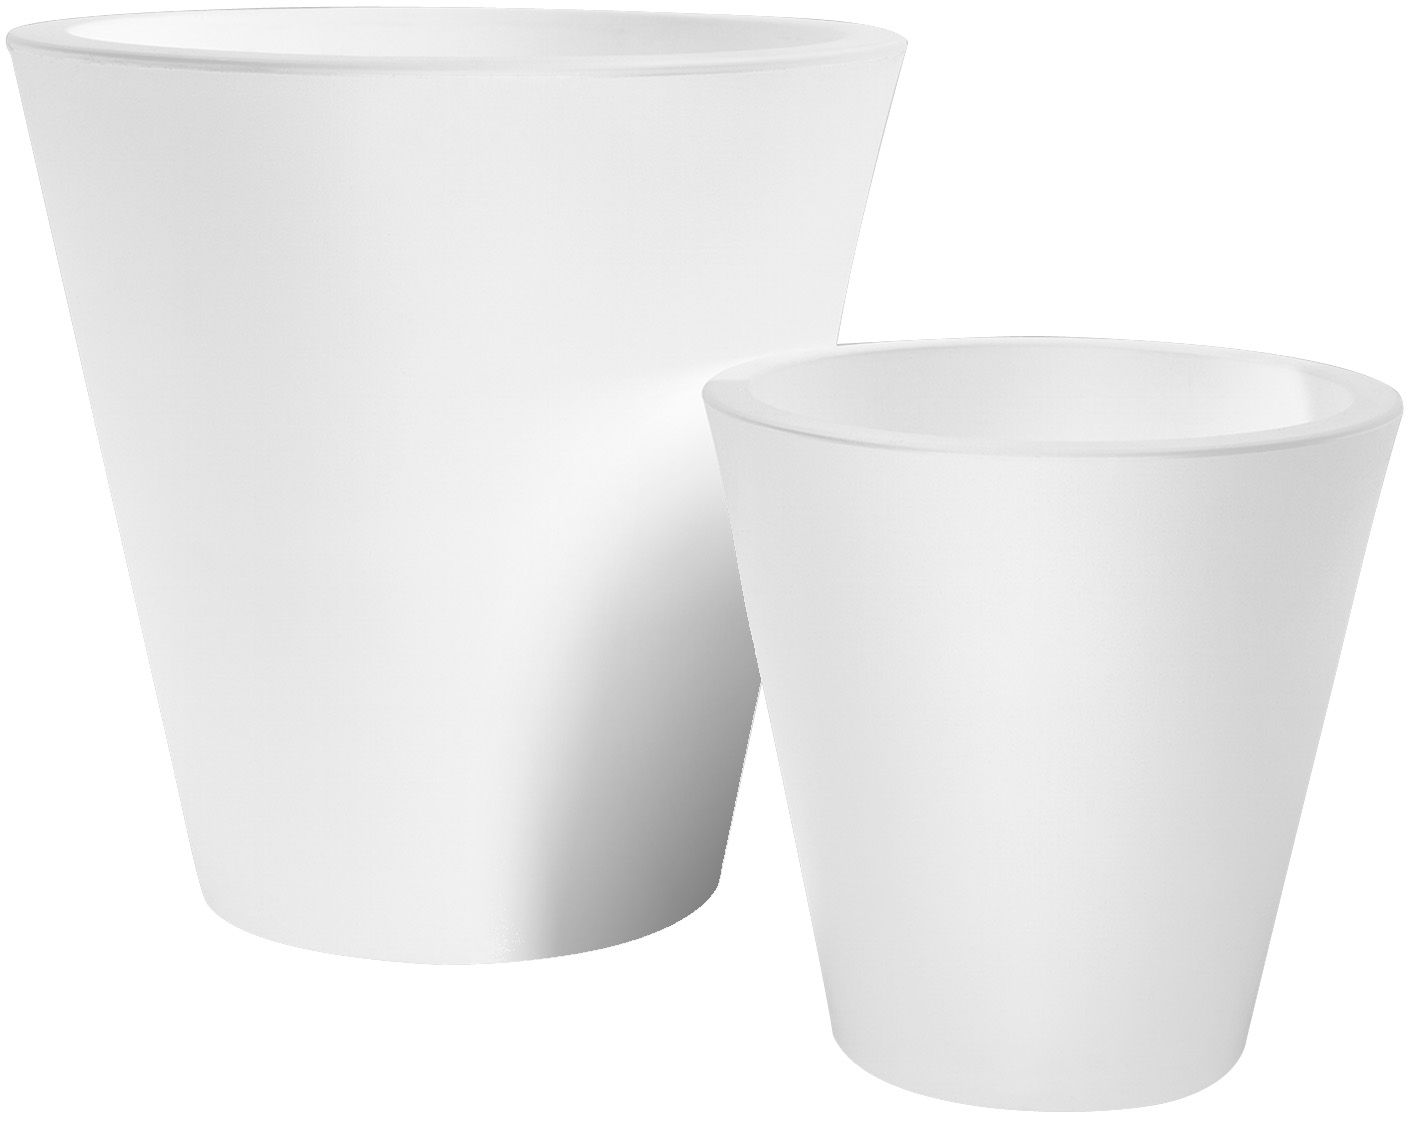 Outdoor - Pots & Plants - New Pot Flowerpot - H 70 cm by Serralunga - White - Polythene